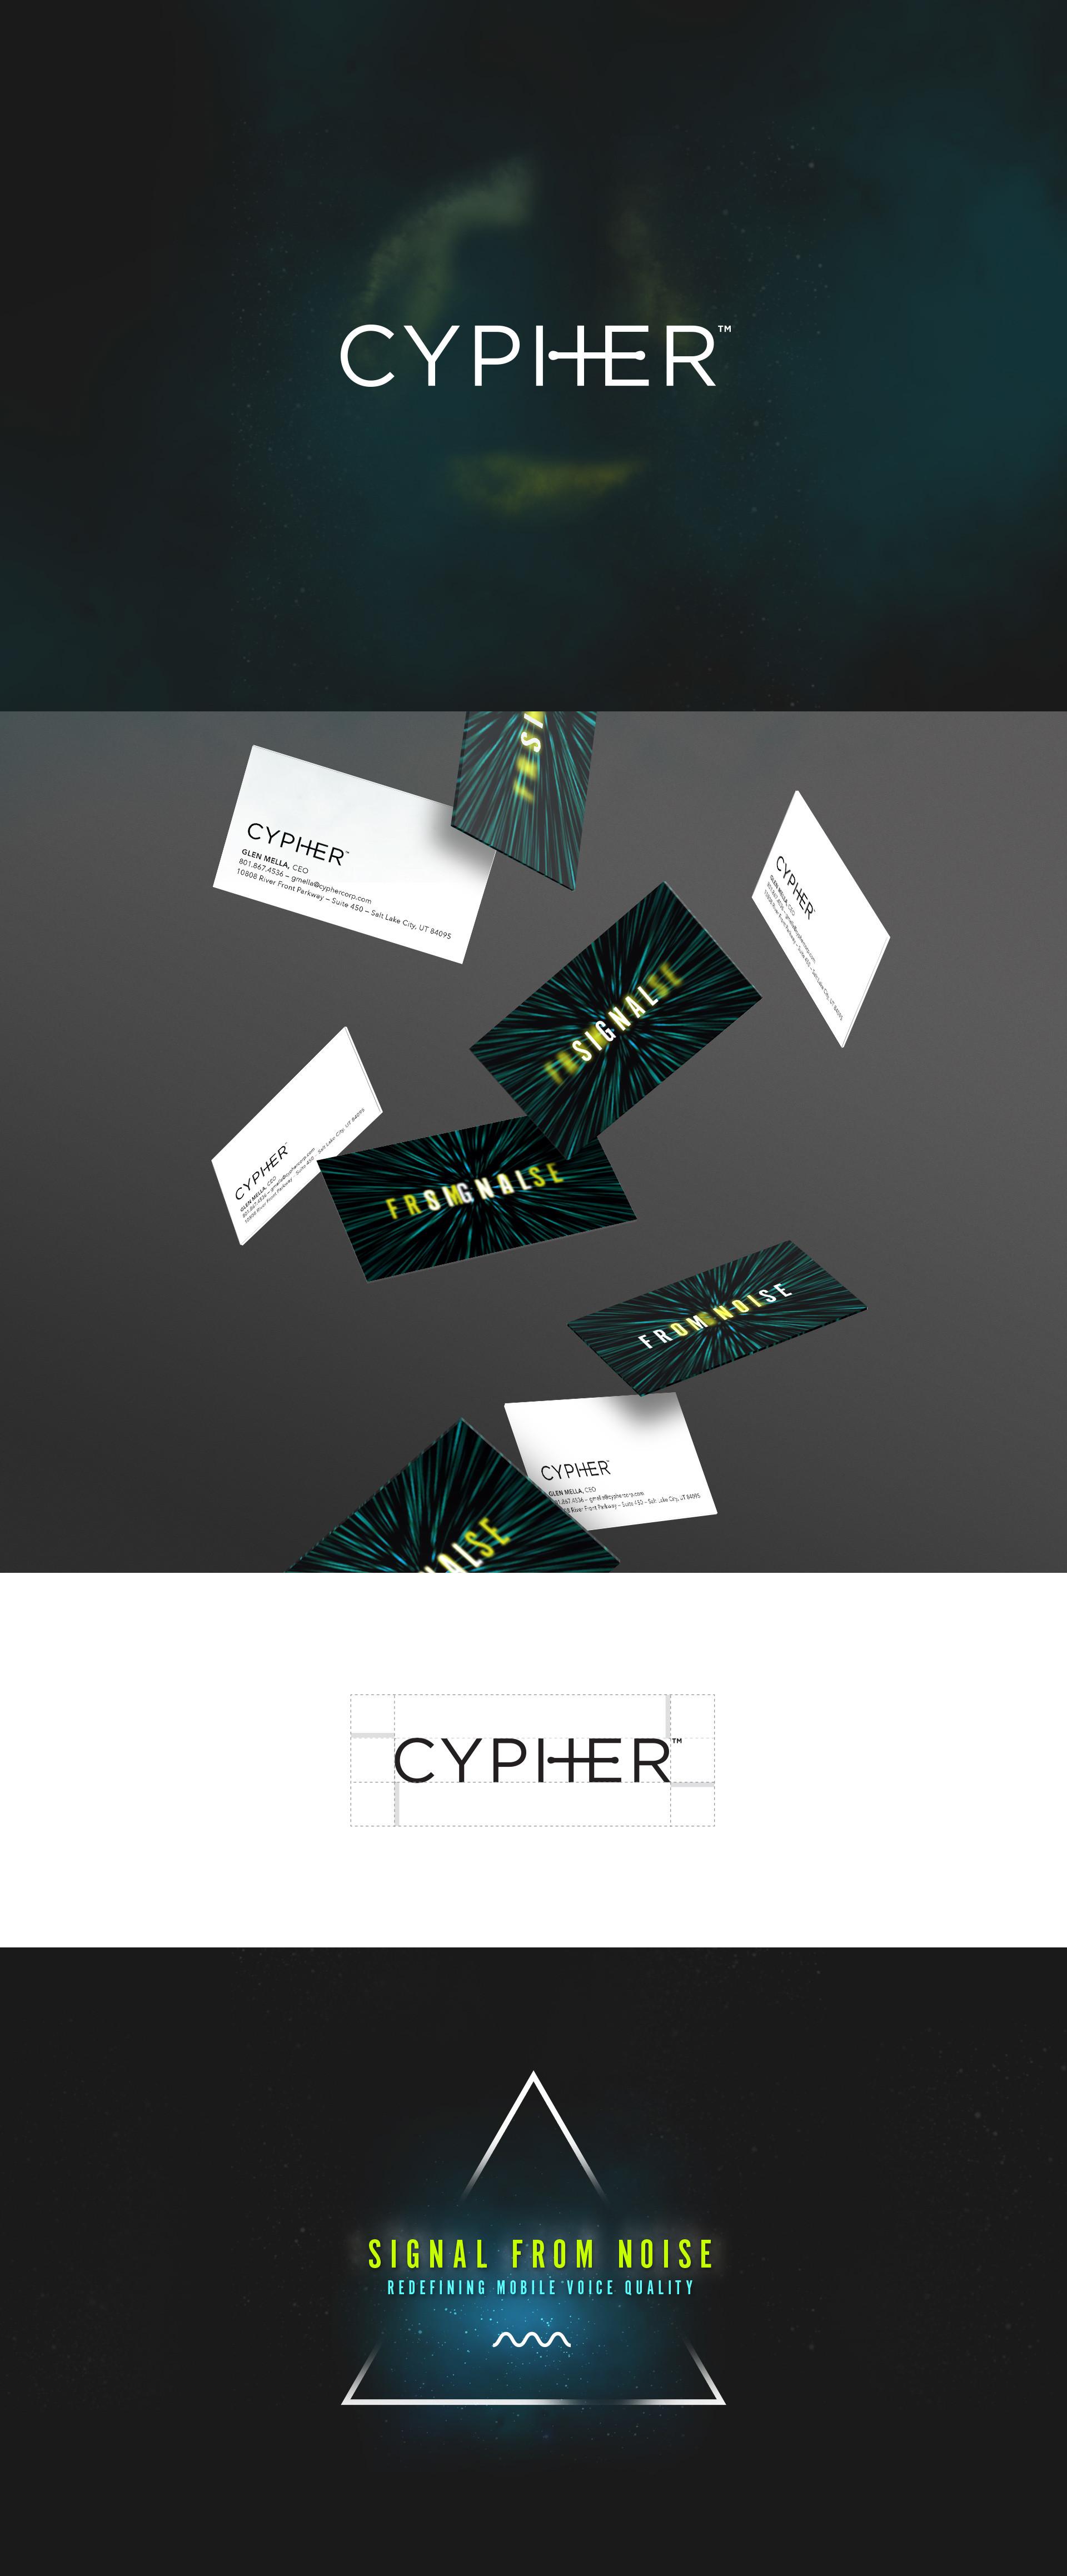 Cypher Brand Identity